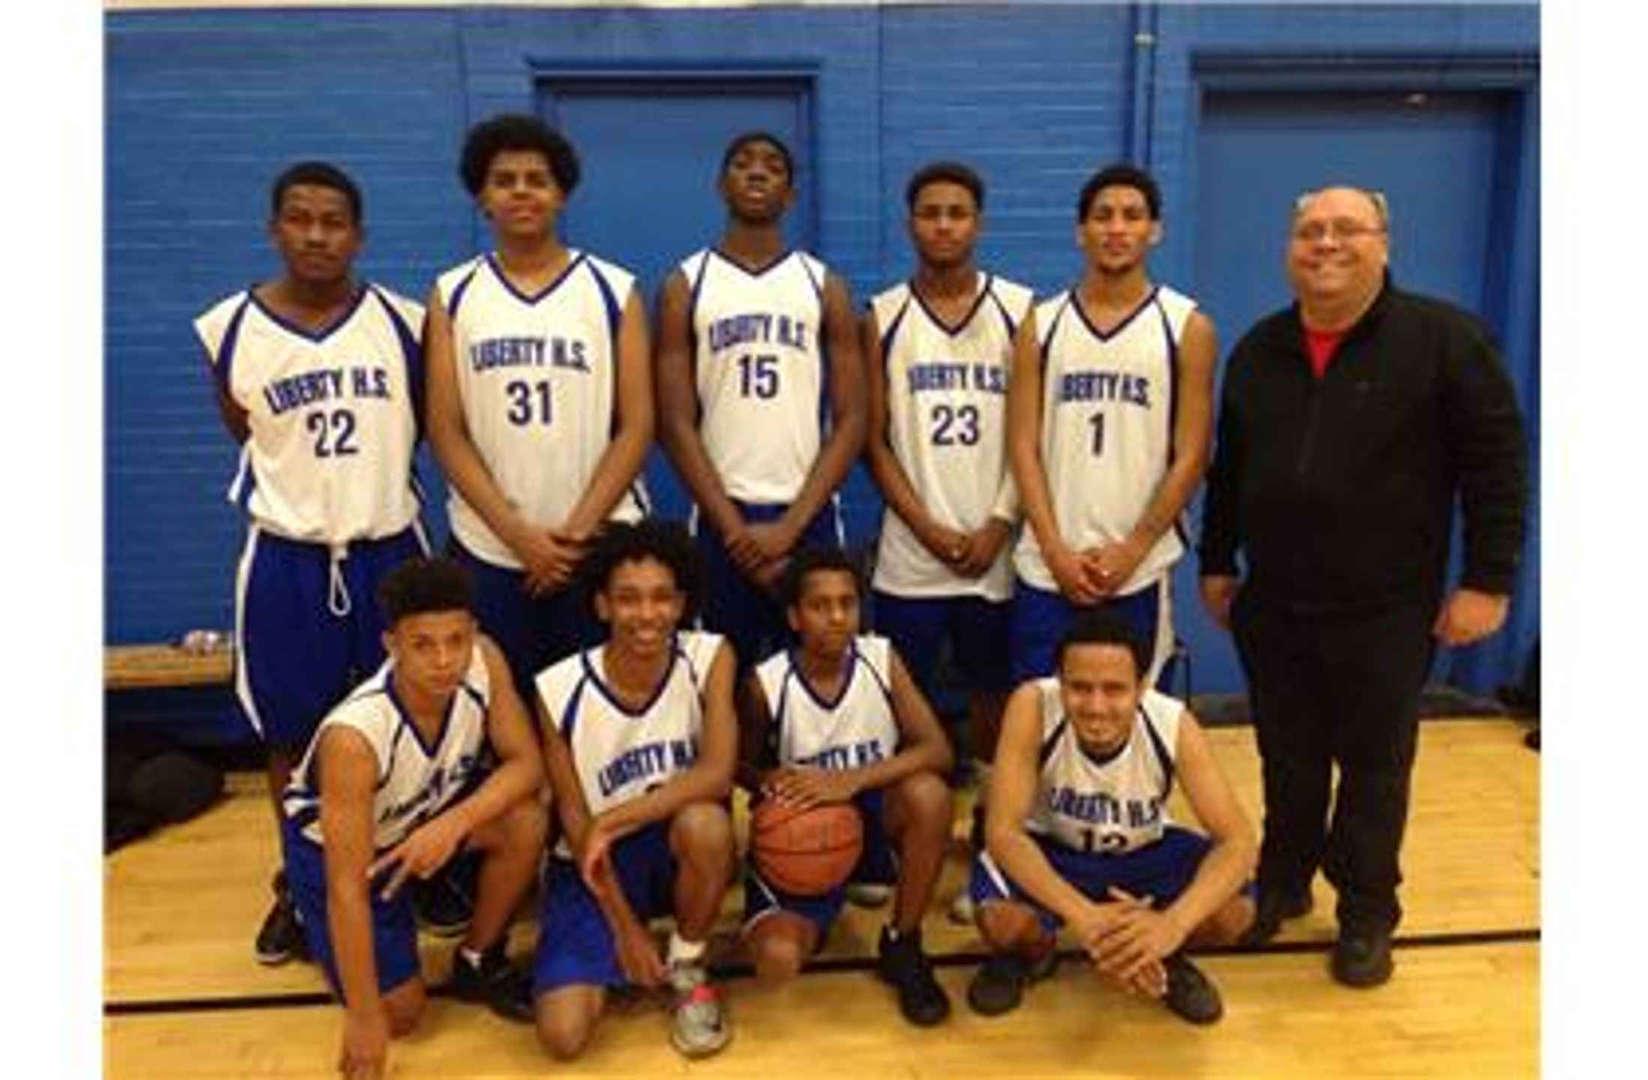 Boy's Basketball Team